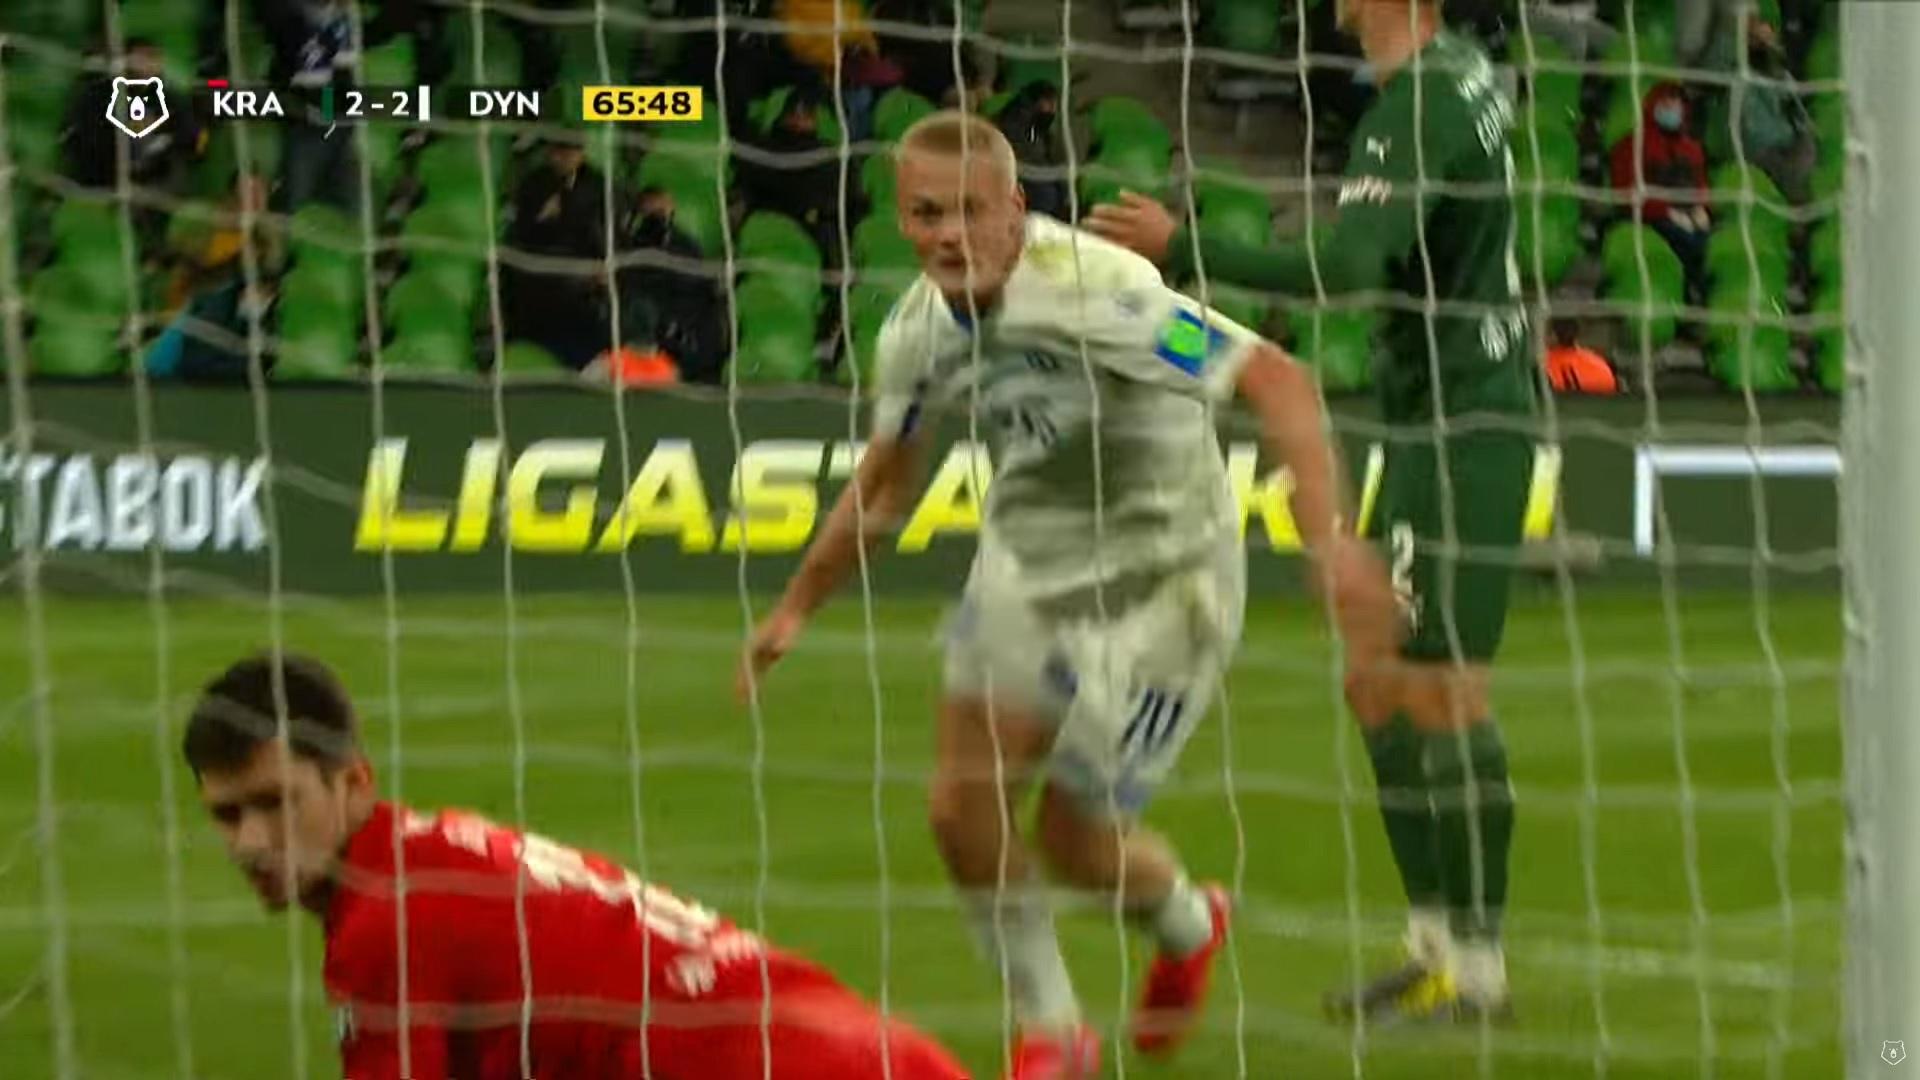 тур 23, Краснодар - Динамо 2:3